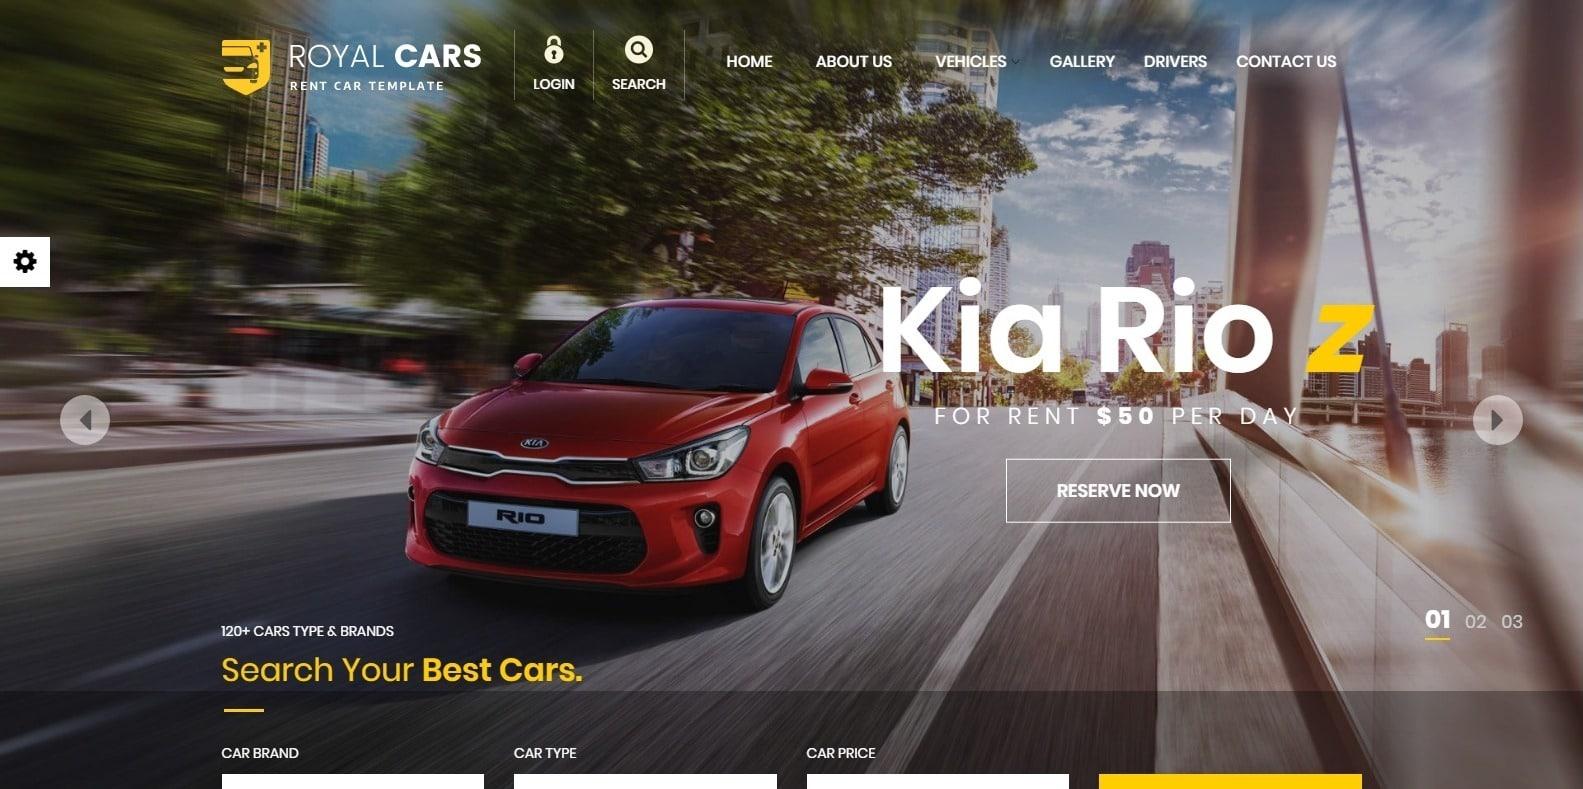 royal-cars-automotive-website-template